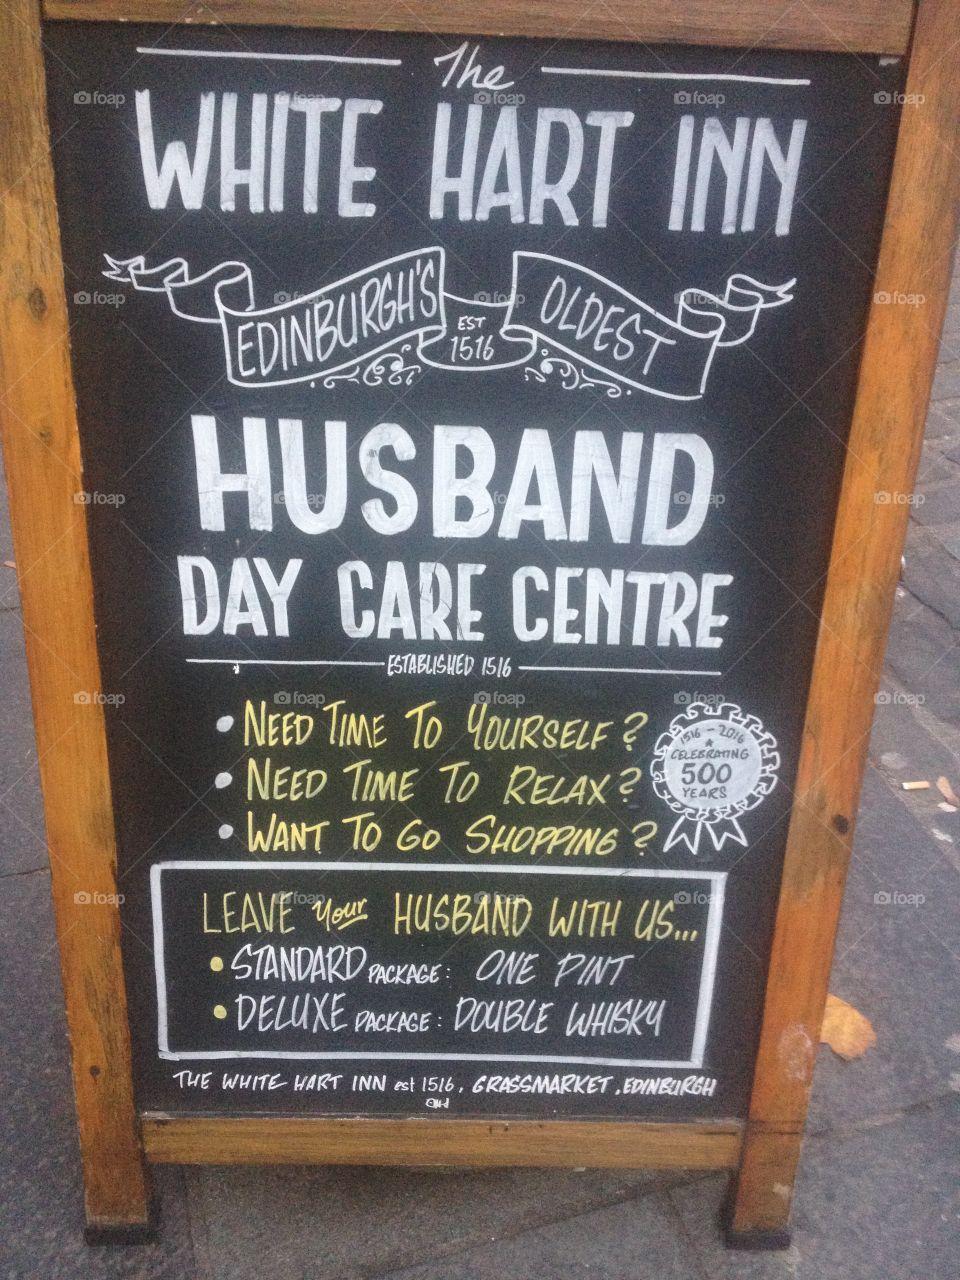 Ladies shopping solution: Husband Day Care Centre - Edinburgh